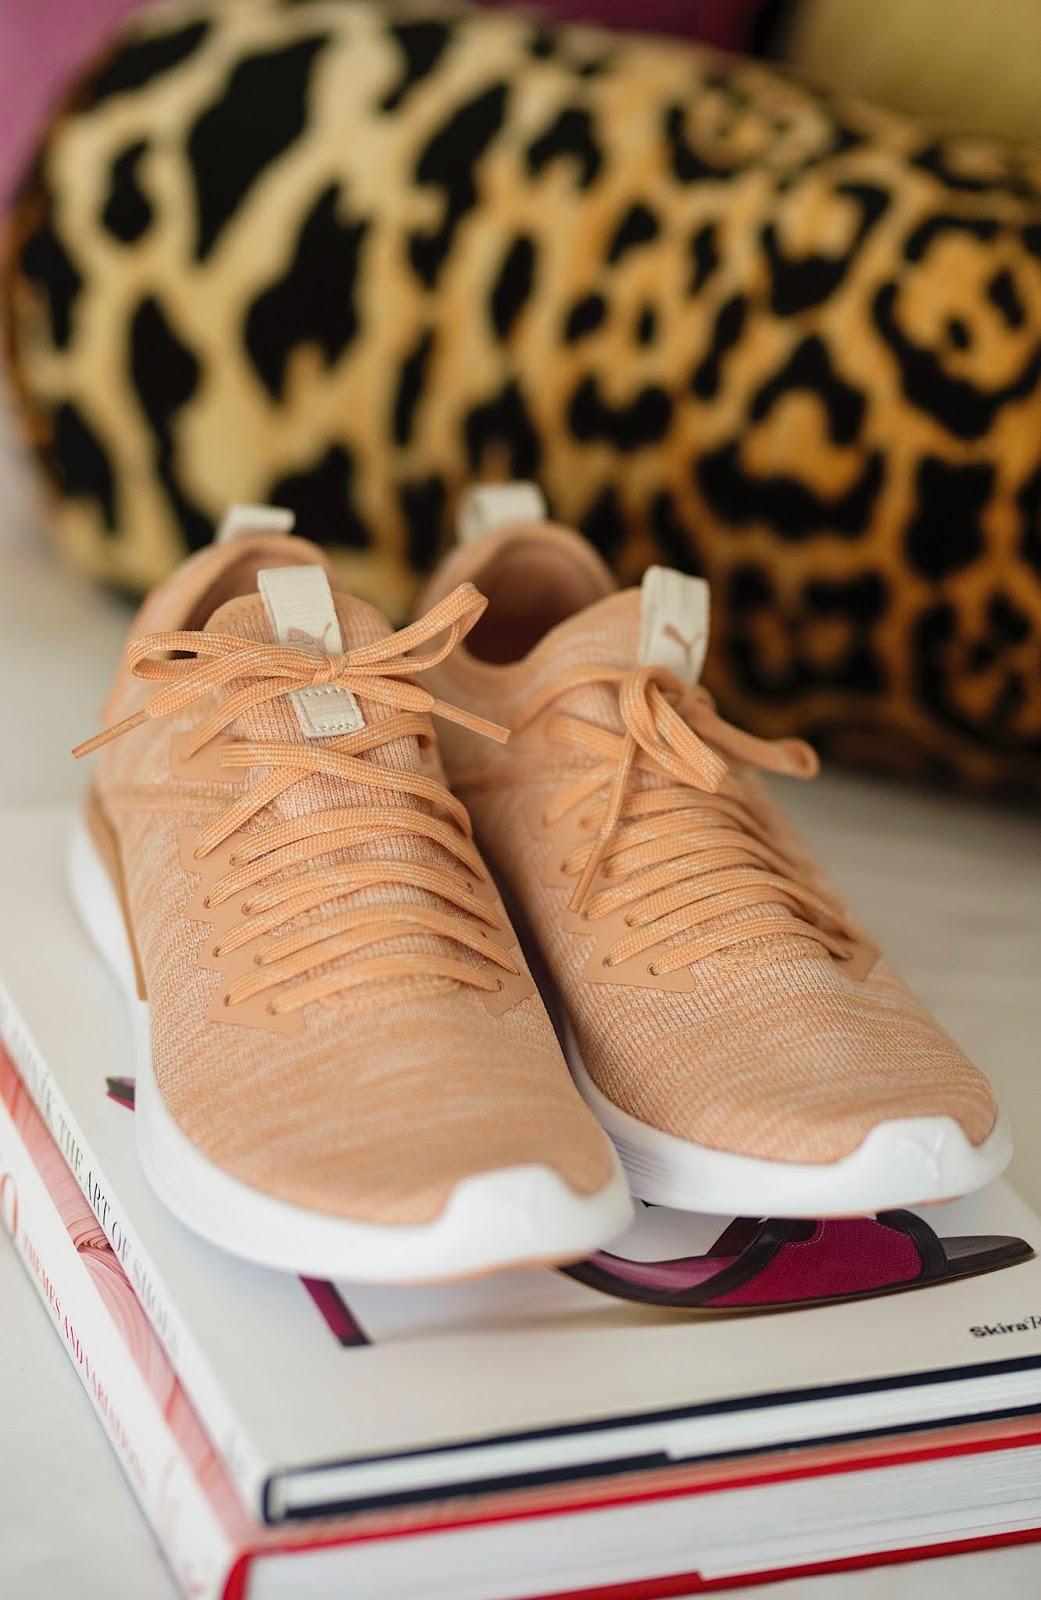 Nordstrom Anniversary Sale PUMA Ignite Flash Evoknit Training Shoe - Something Delightful Blog